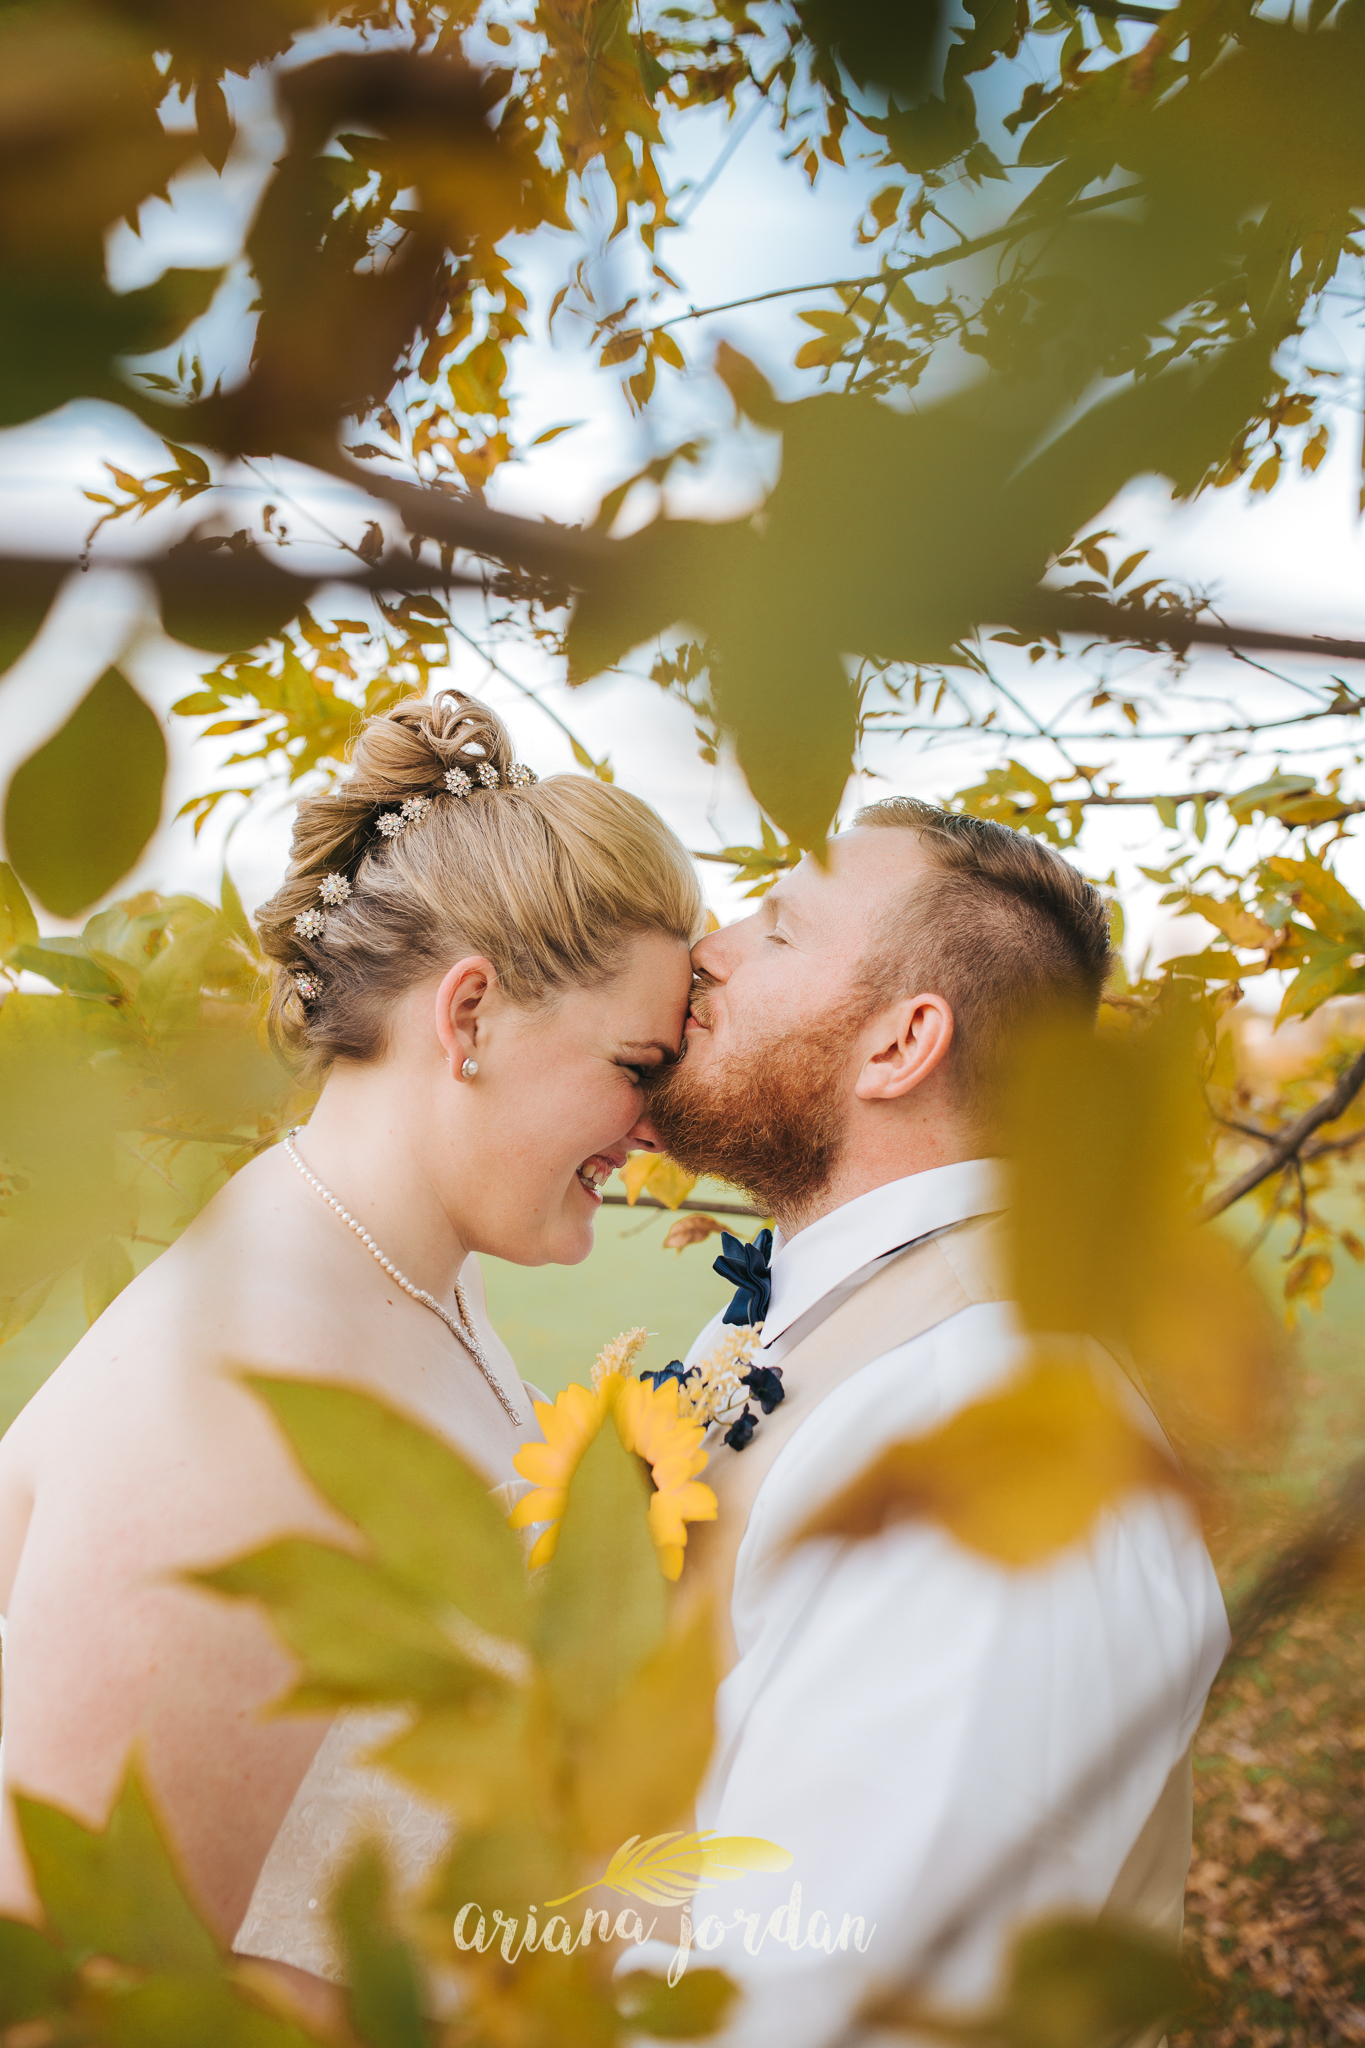 0088 Ariana Jordan Photography - Georgetown KY Wedding Photographer 8817.jpg